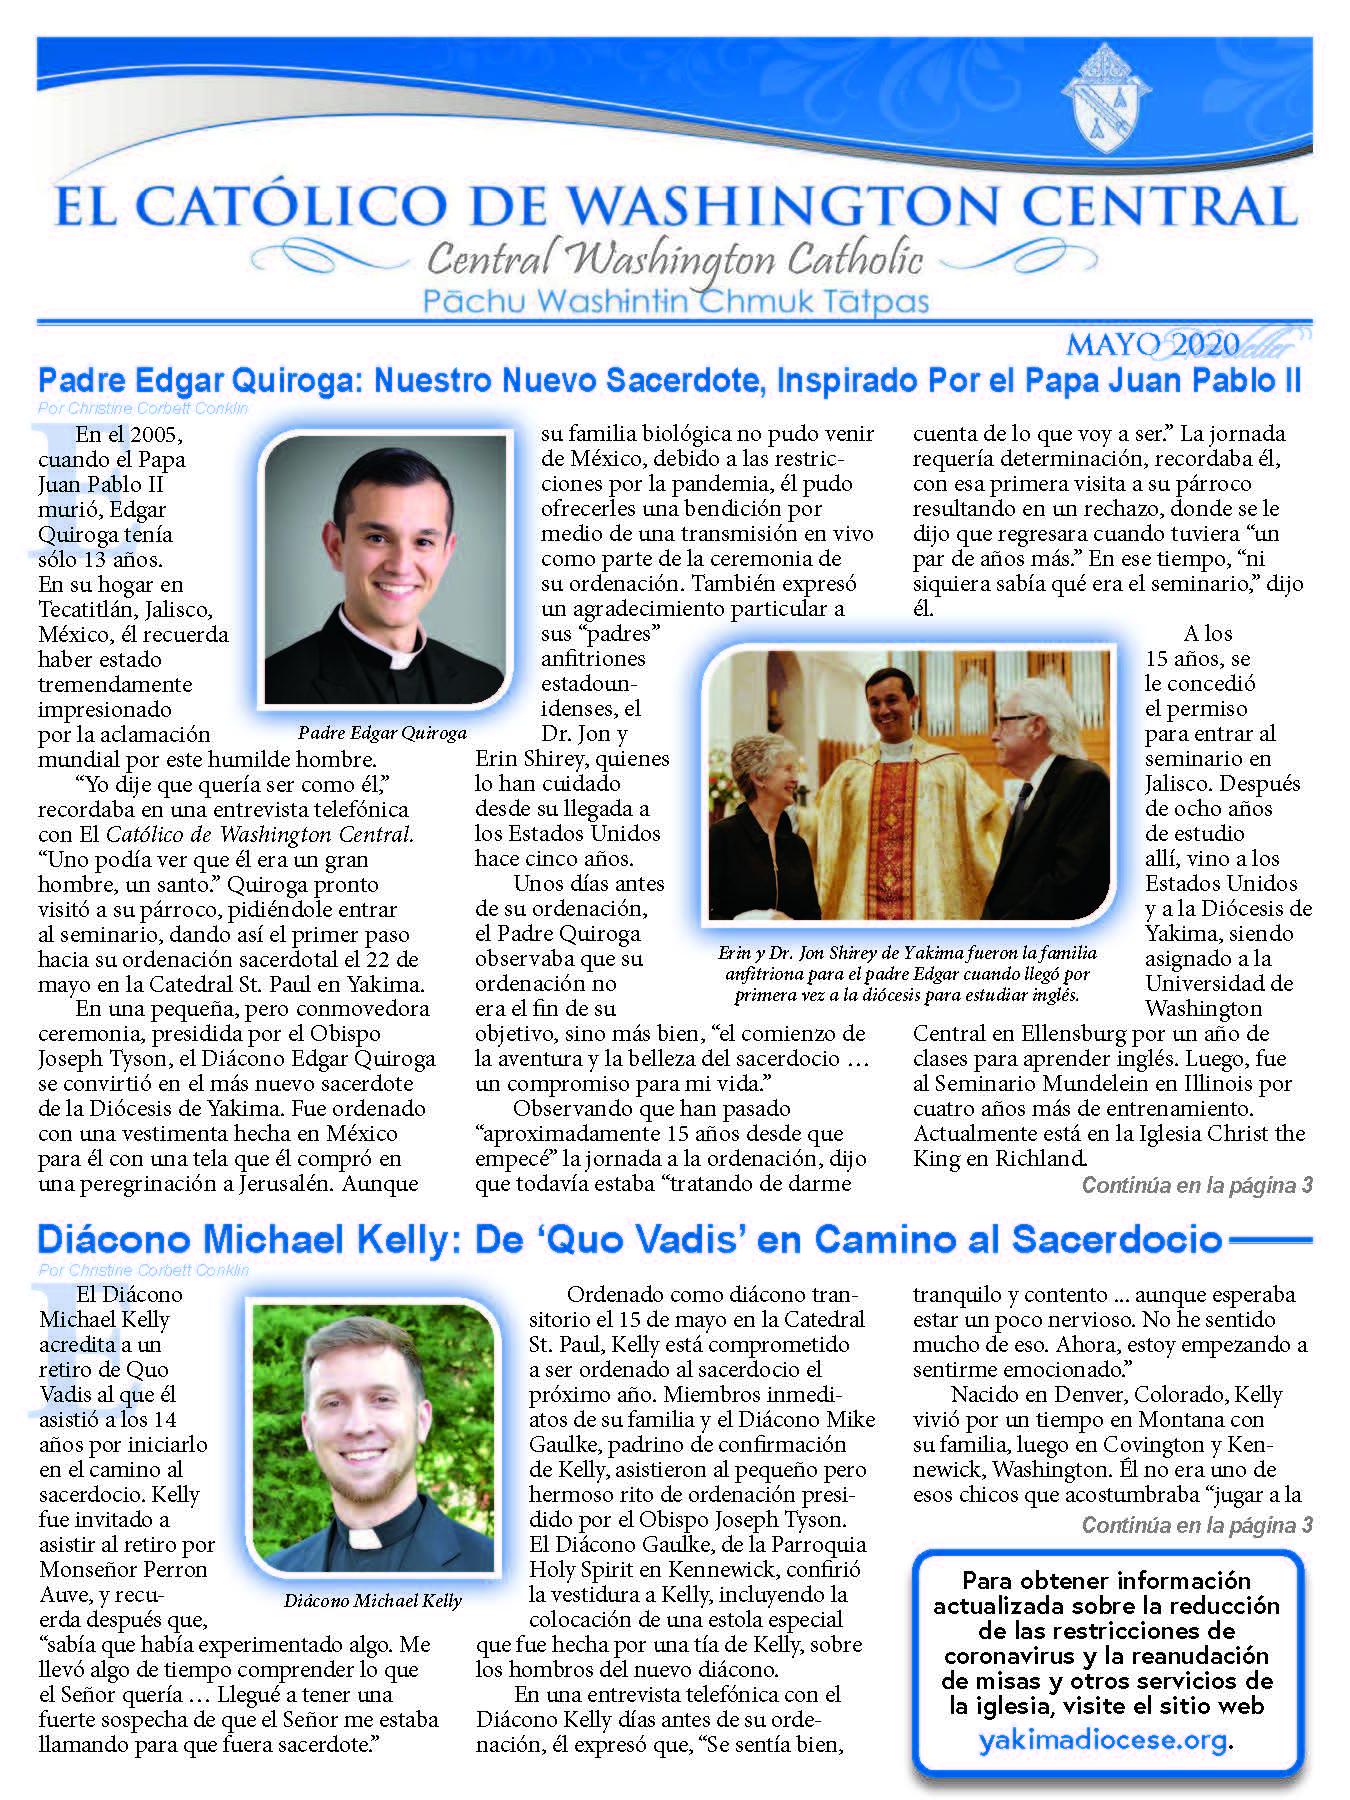 May 2020 Central Washington Catholic   El Católico Washington Central